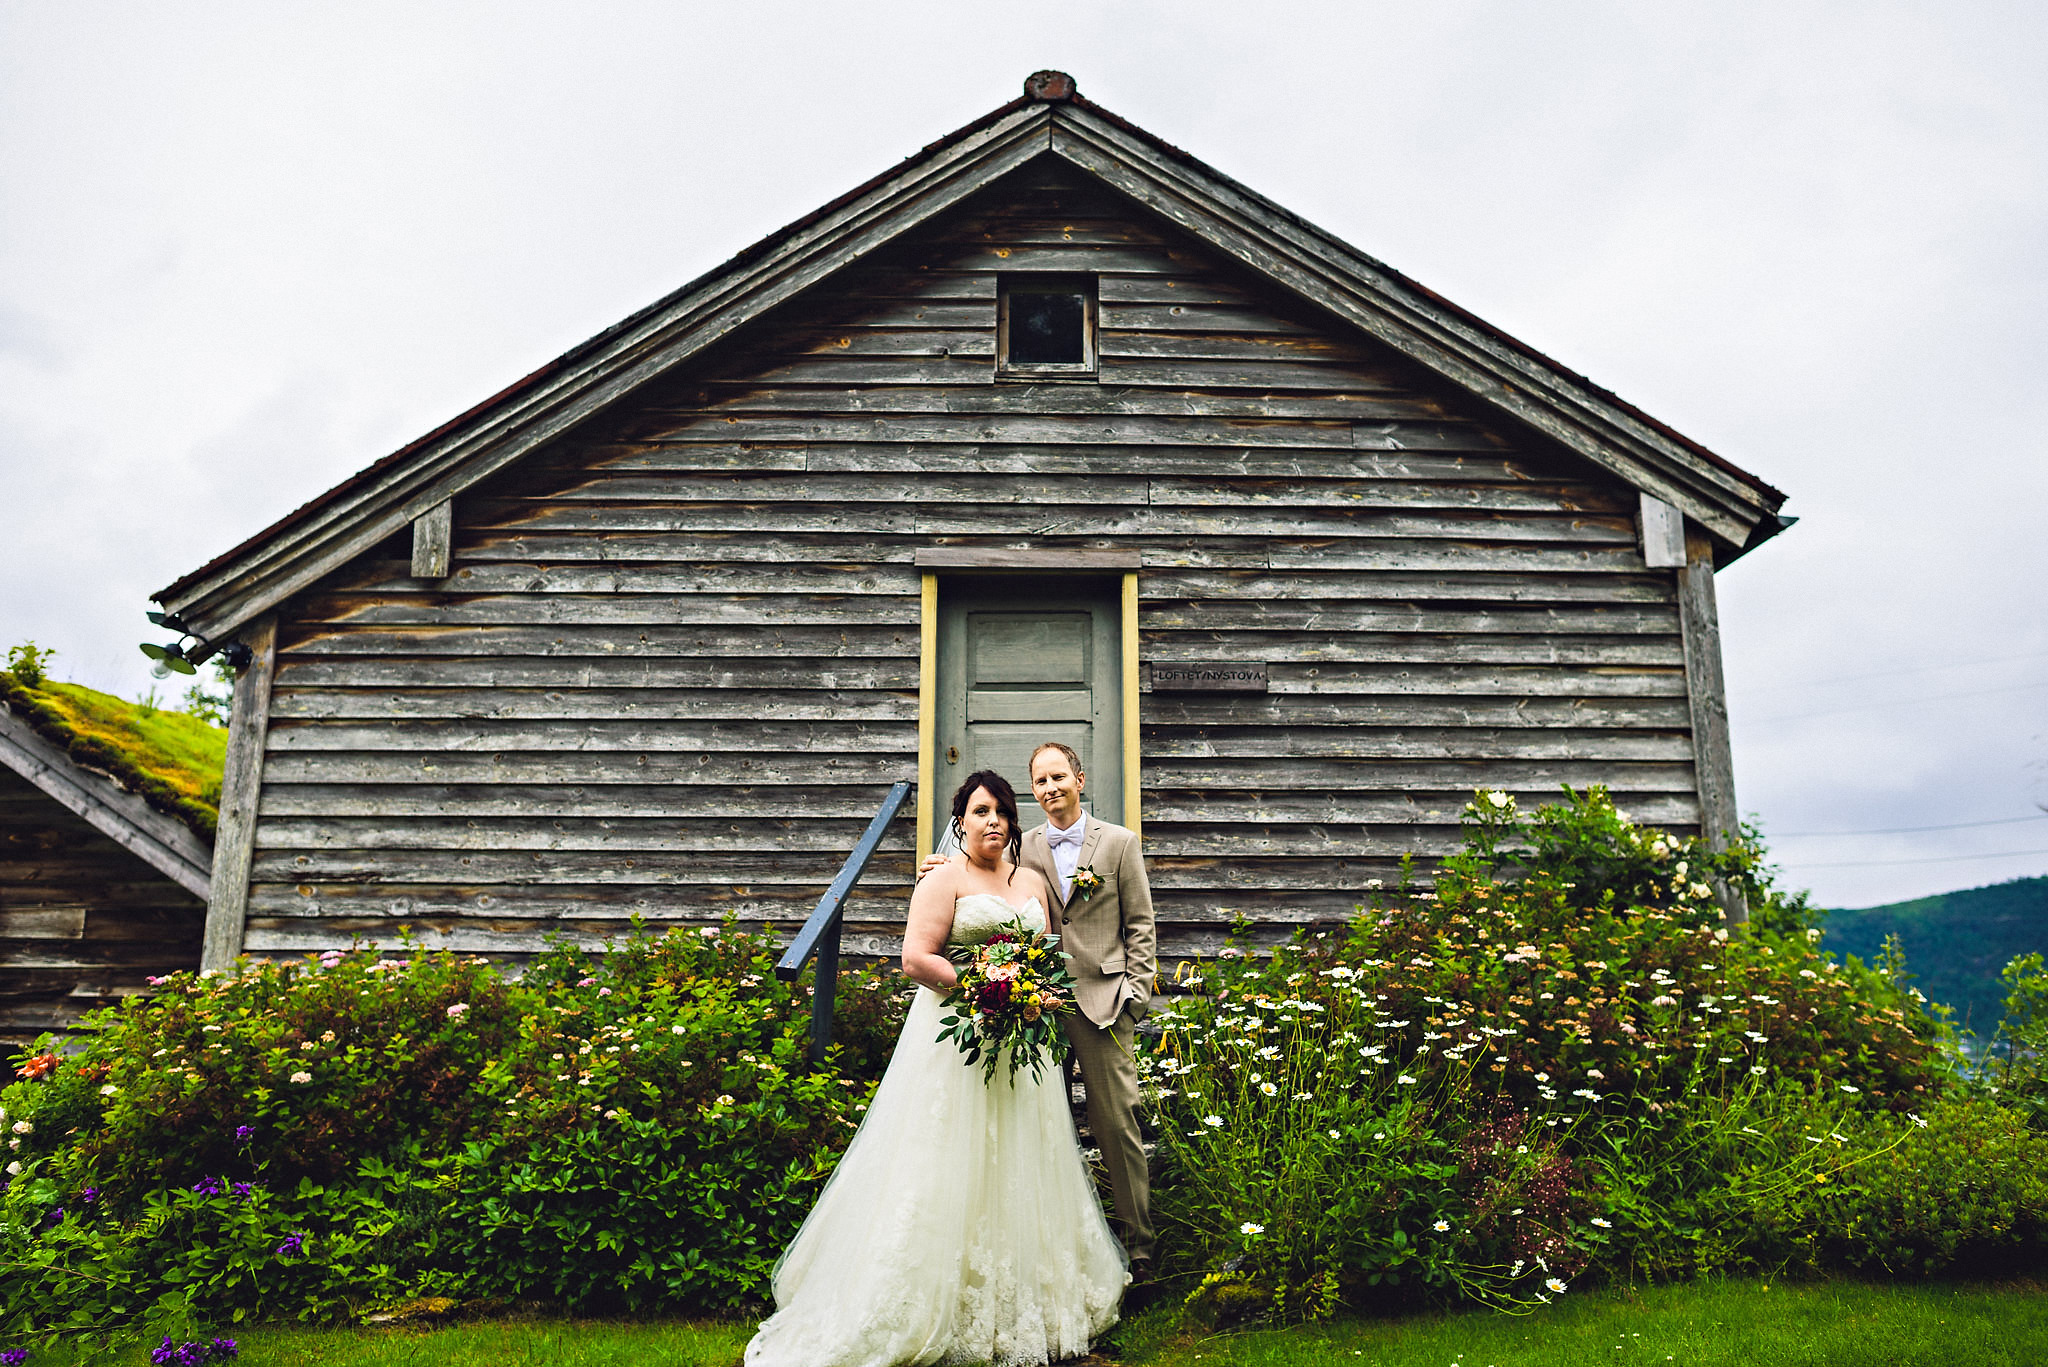 Bryllup på Yrineset i Oldedalen bryllupsfotograf sogn og fjordane-4.jpg